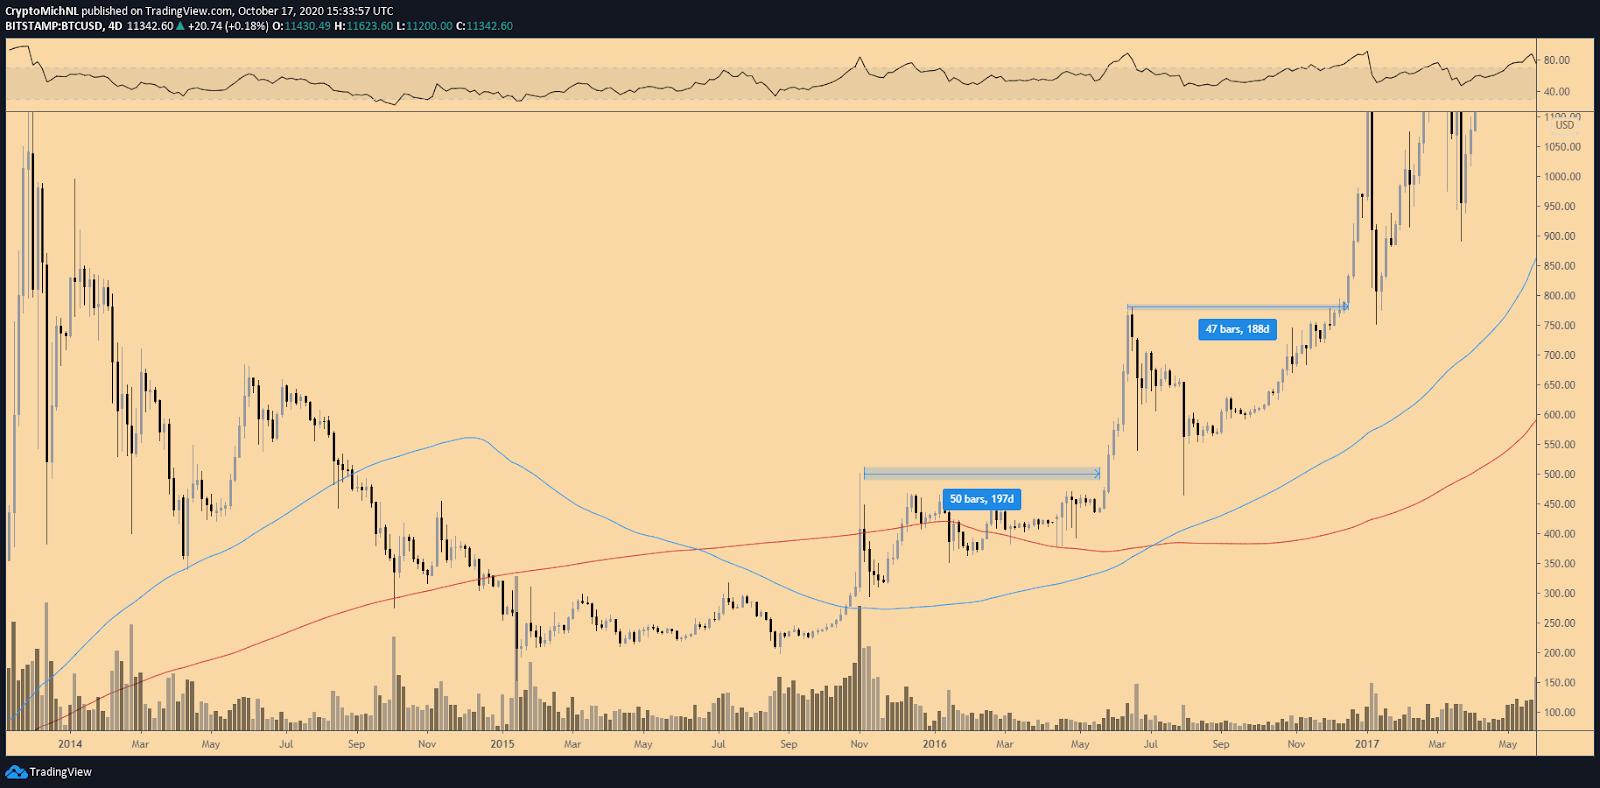 BTC/USD 4-day chart. Source: TradingView